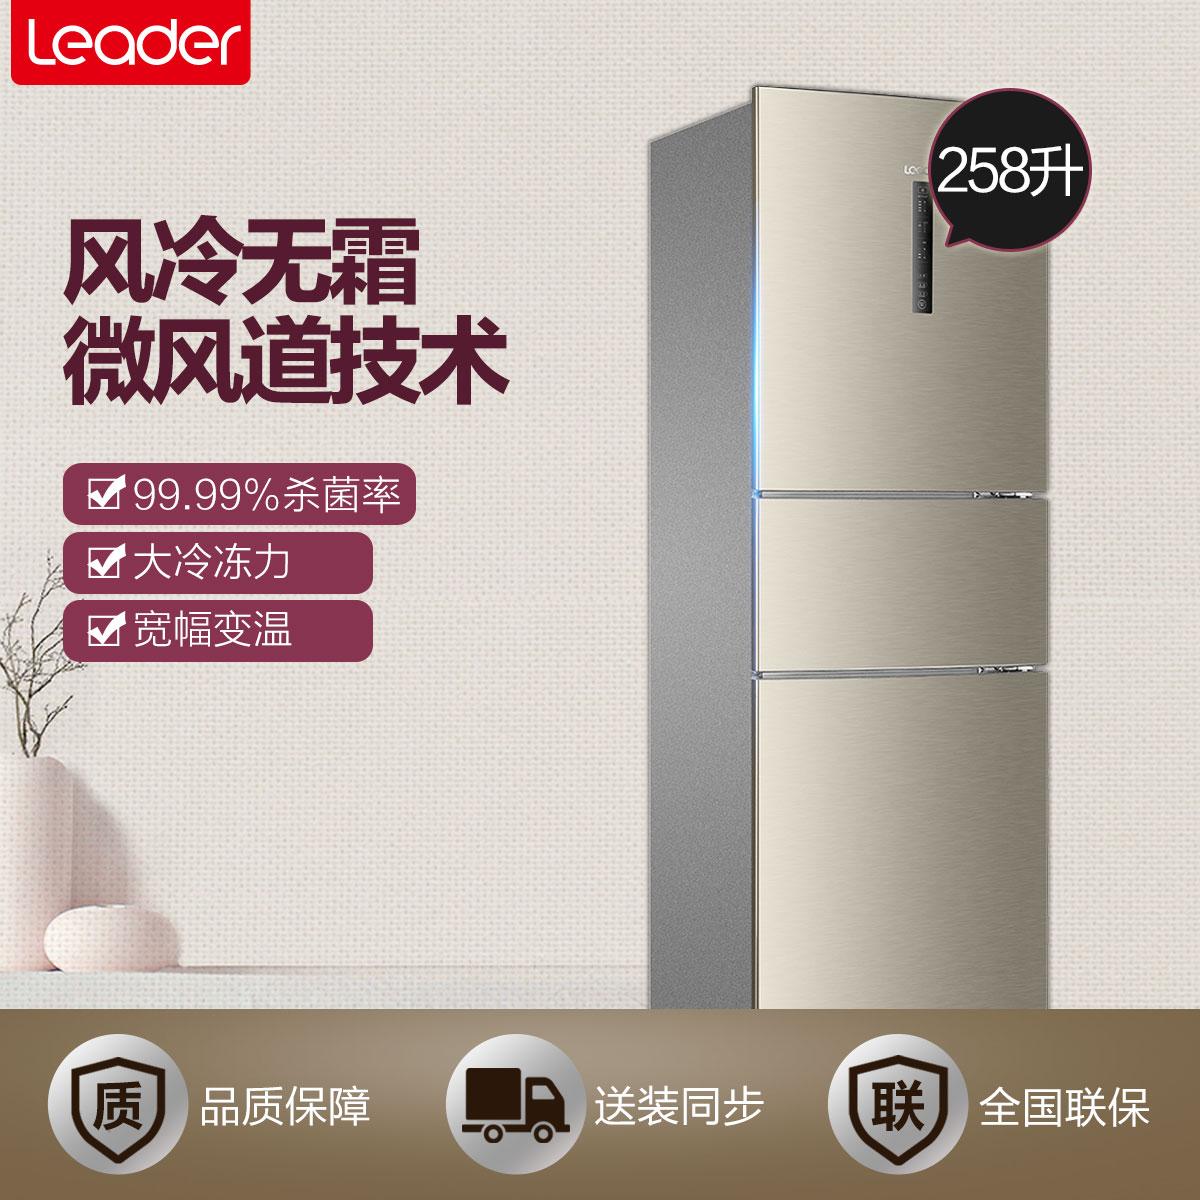 BCD-258WLDPN 258升三门冷藏冷冻风冷无霜节能电冰箱